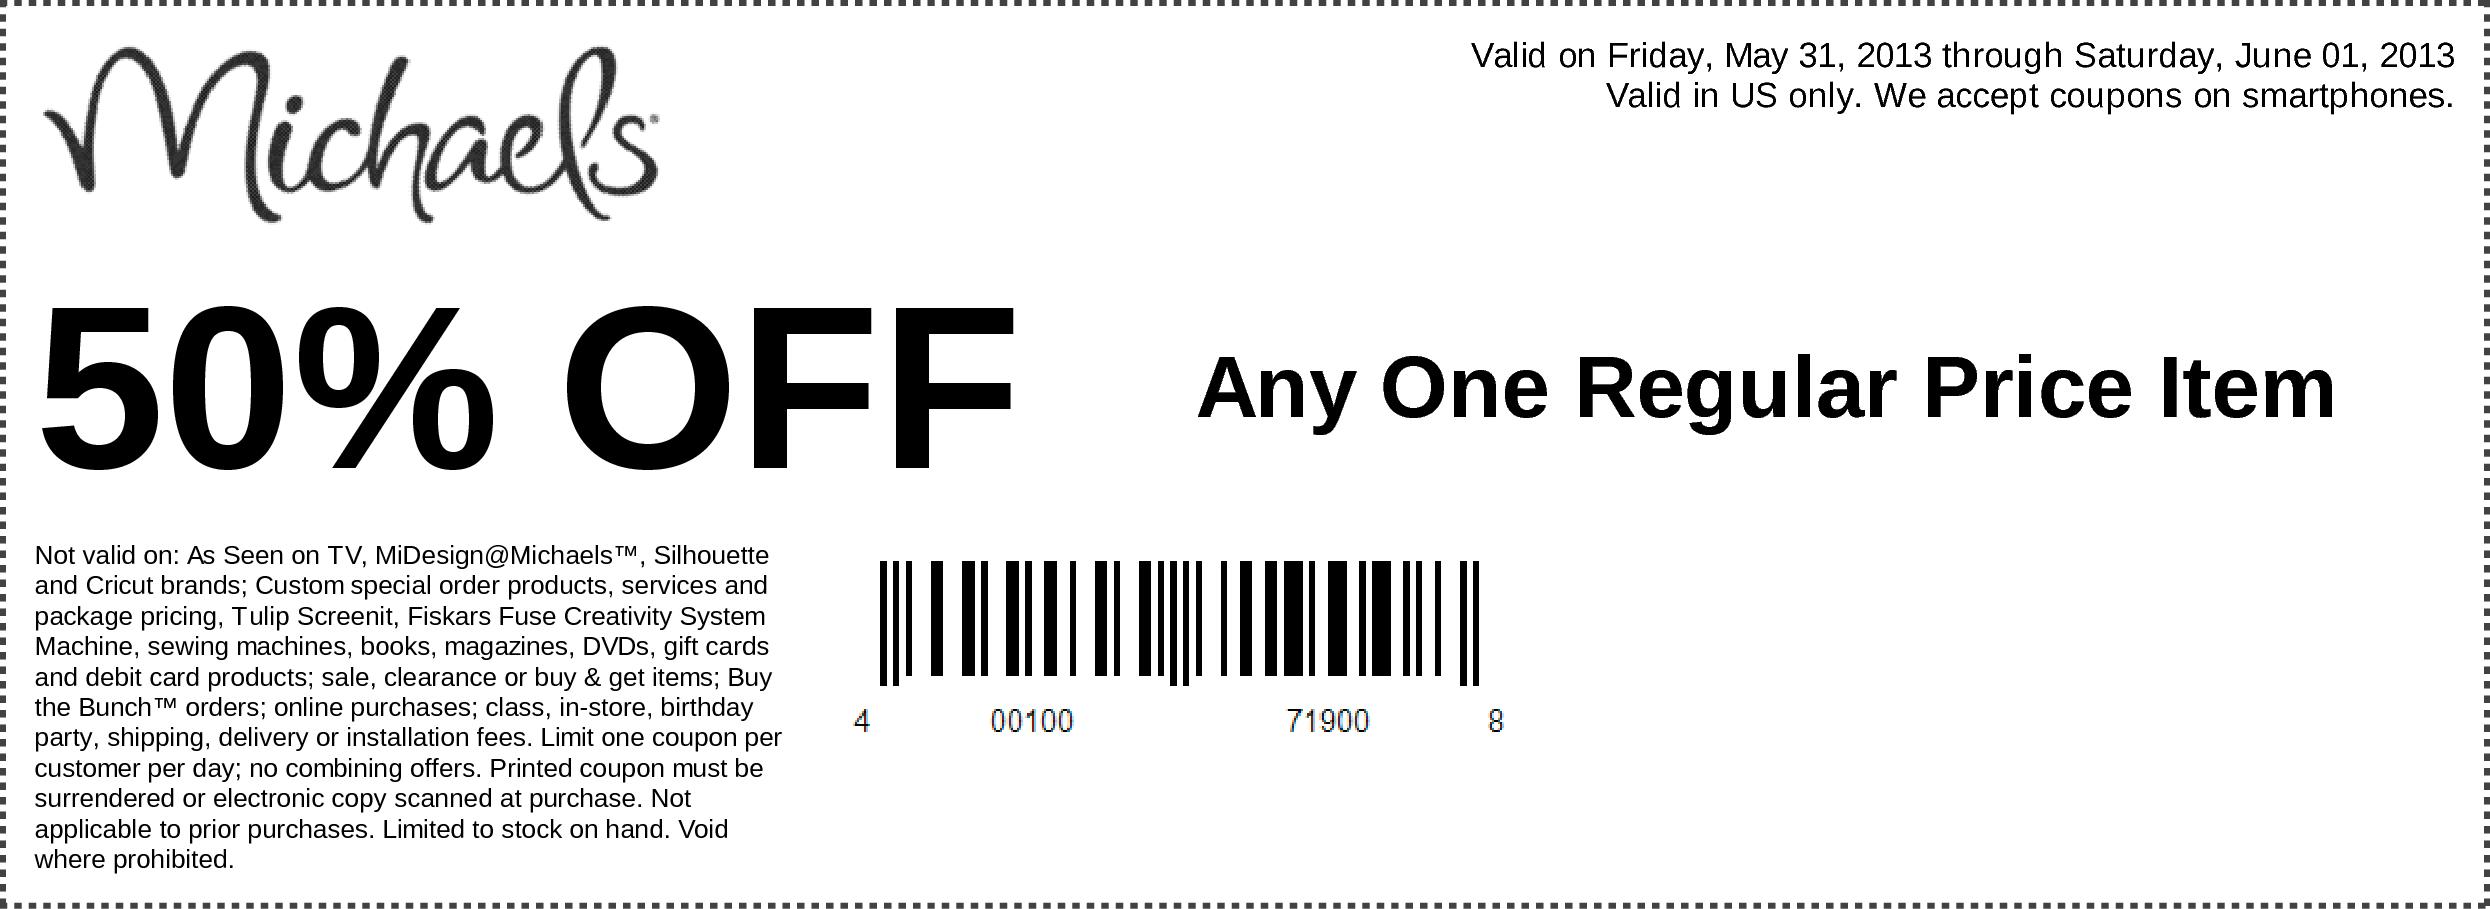 Free-Michaels-Printable-Coupons-2017 – Printable Coupons Online - Free Printable Coupons 2017